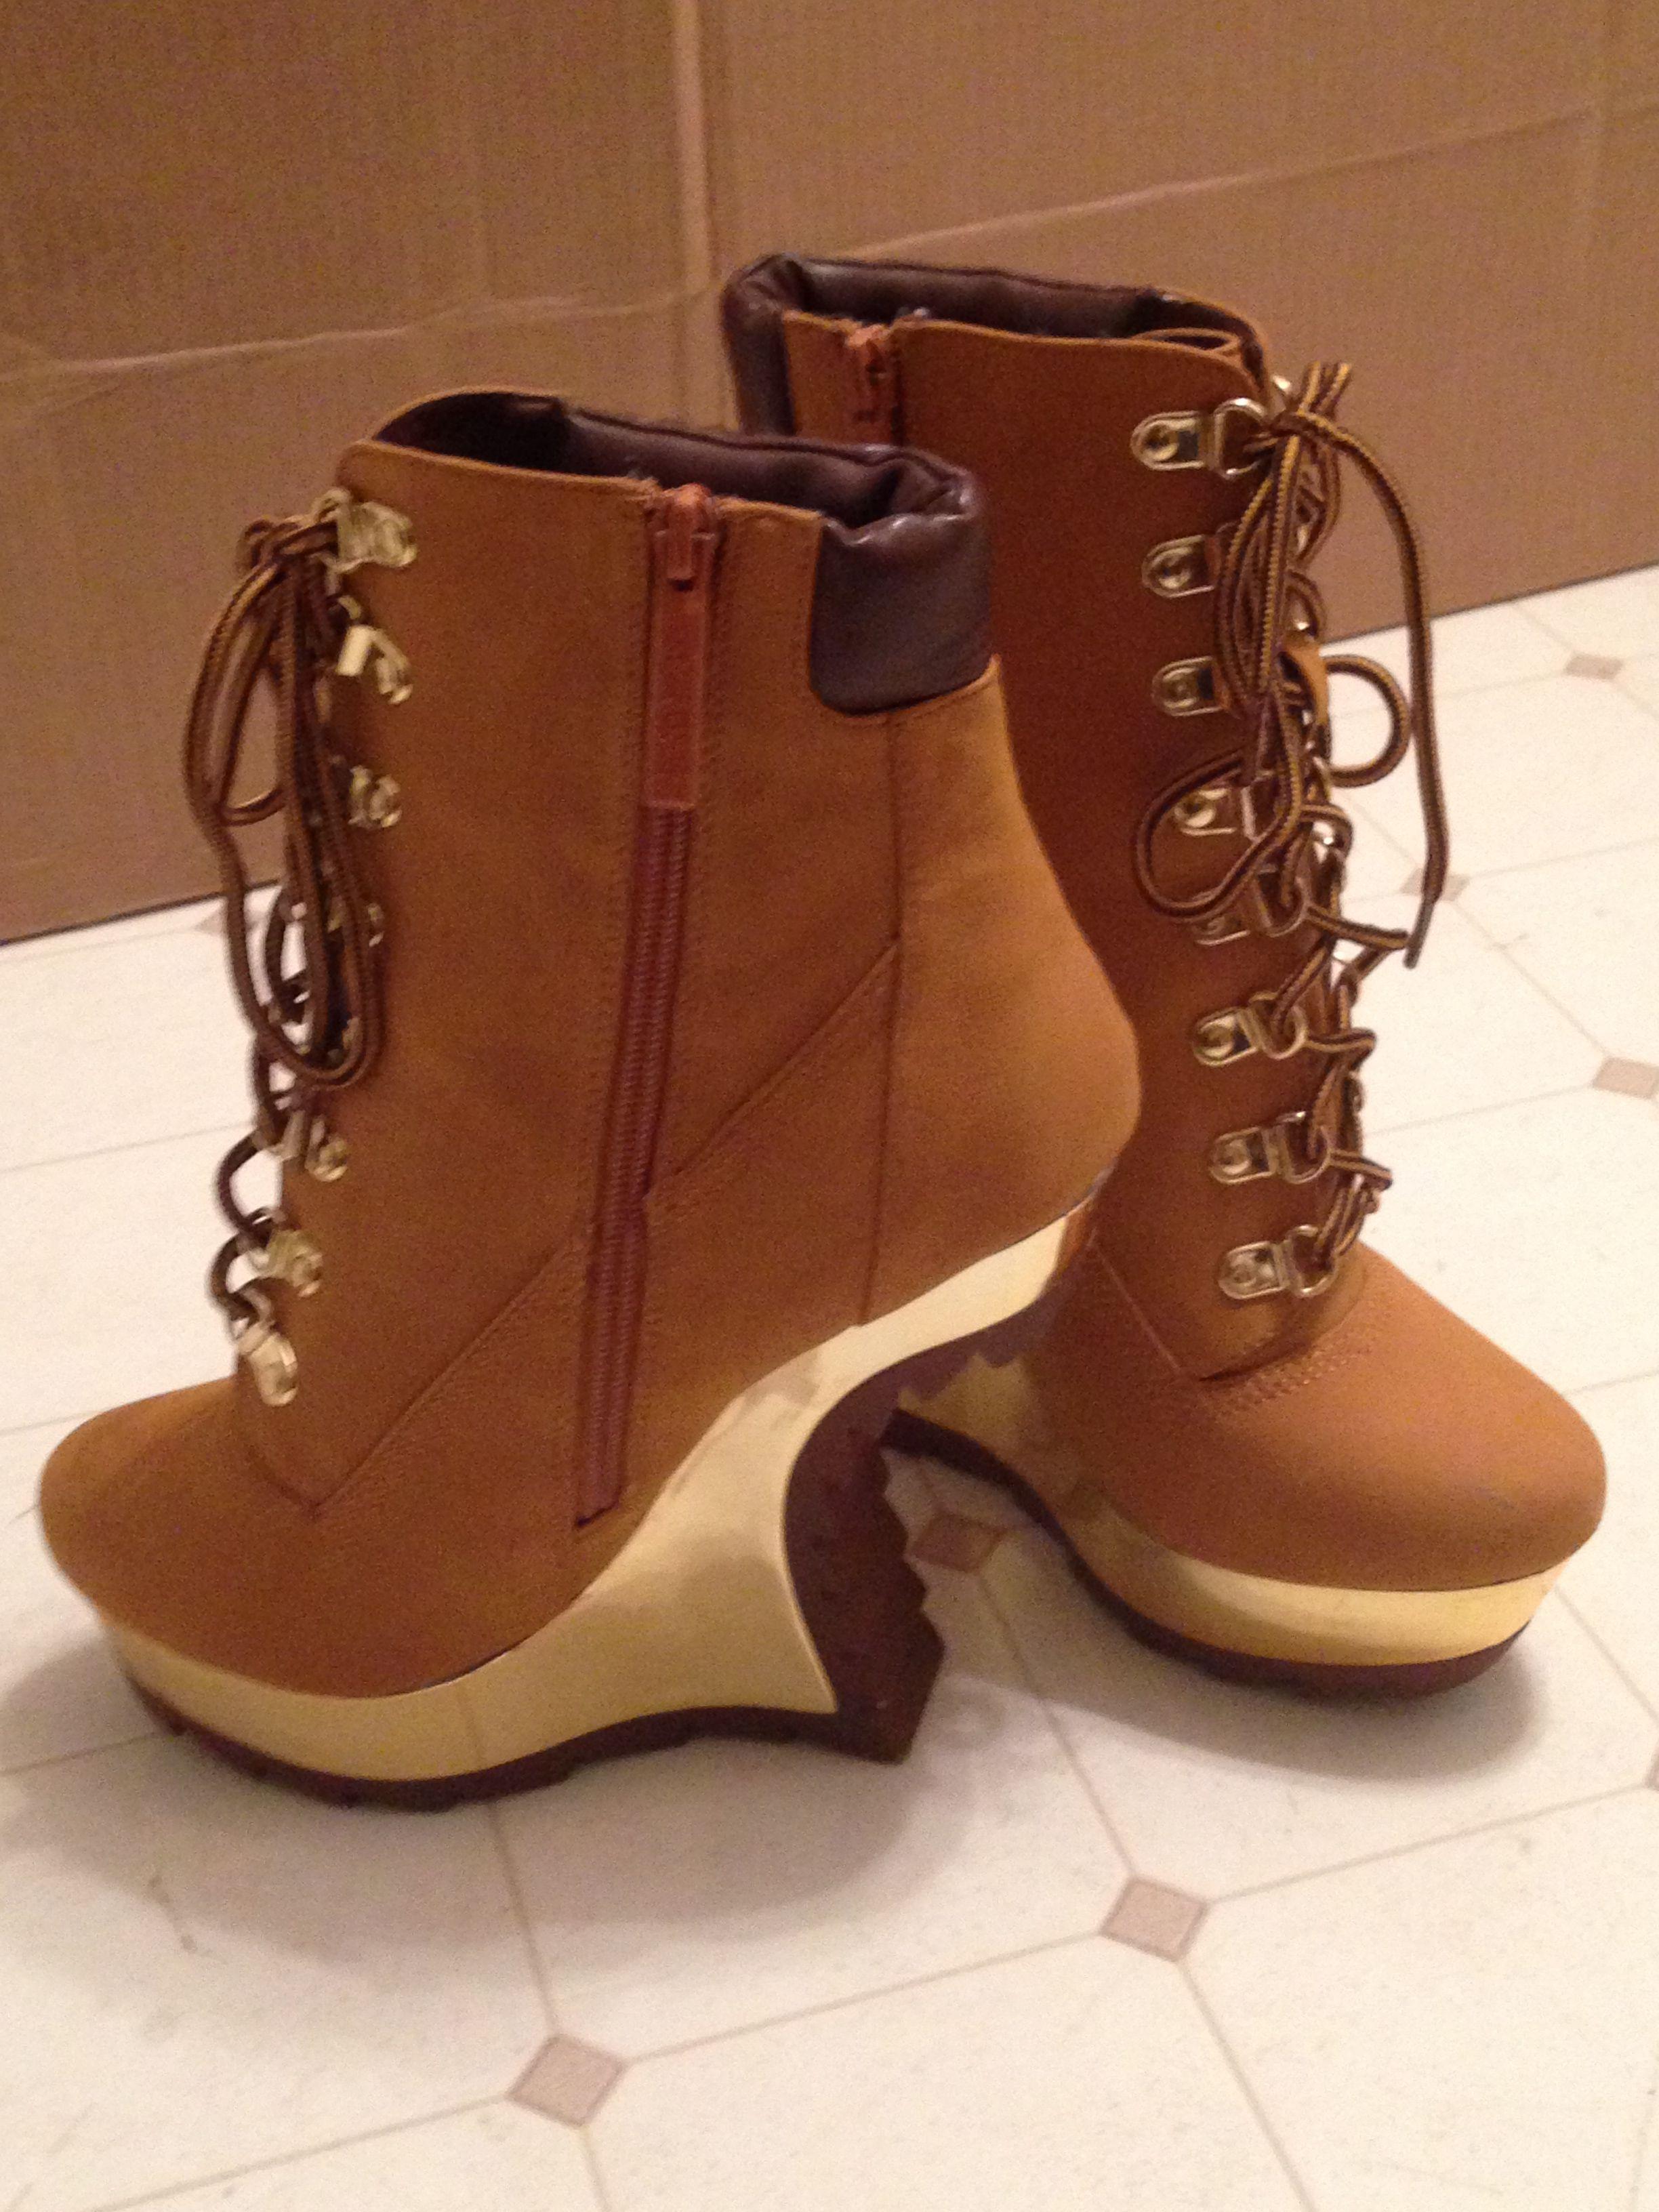 Alba Bond's Timberland inspired heel-less heel booties. Tan laceup heeless  gold mirrored platform